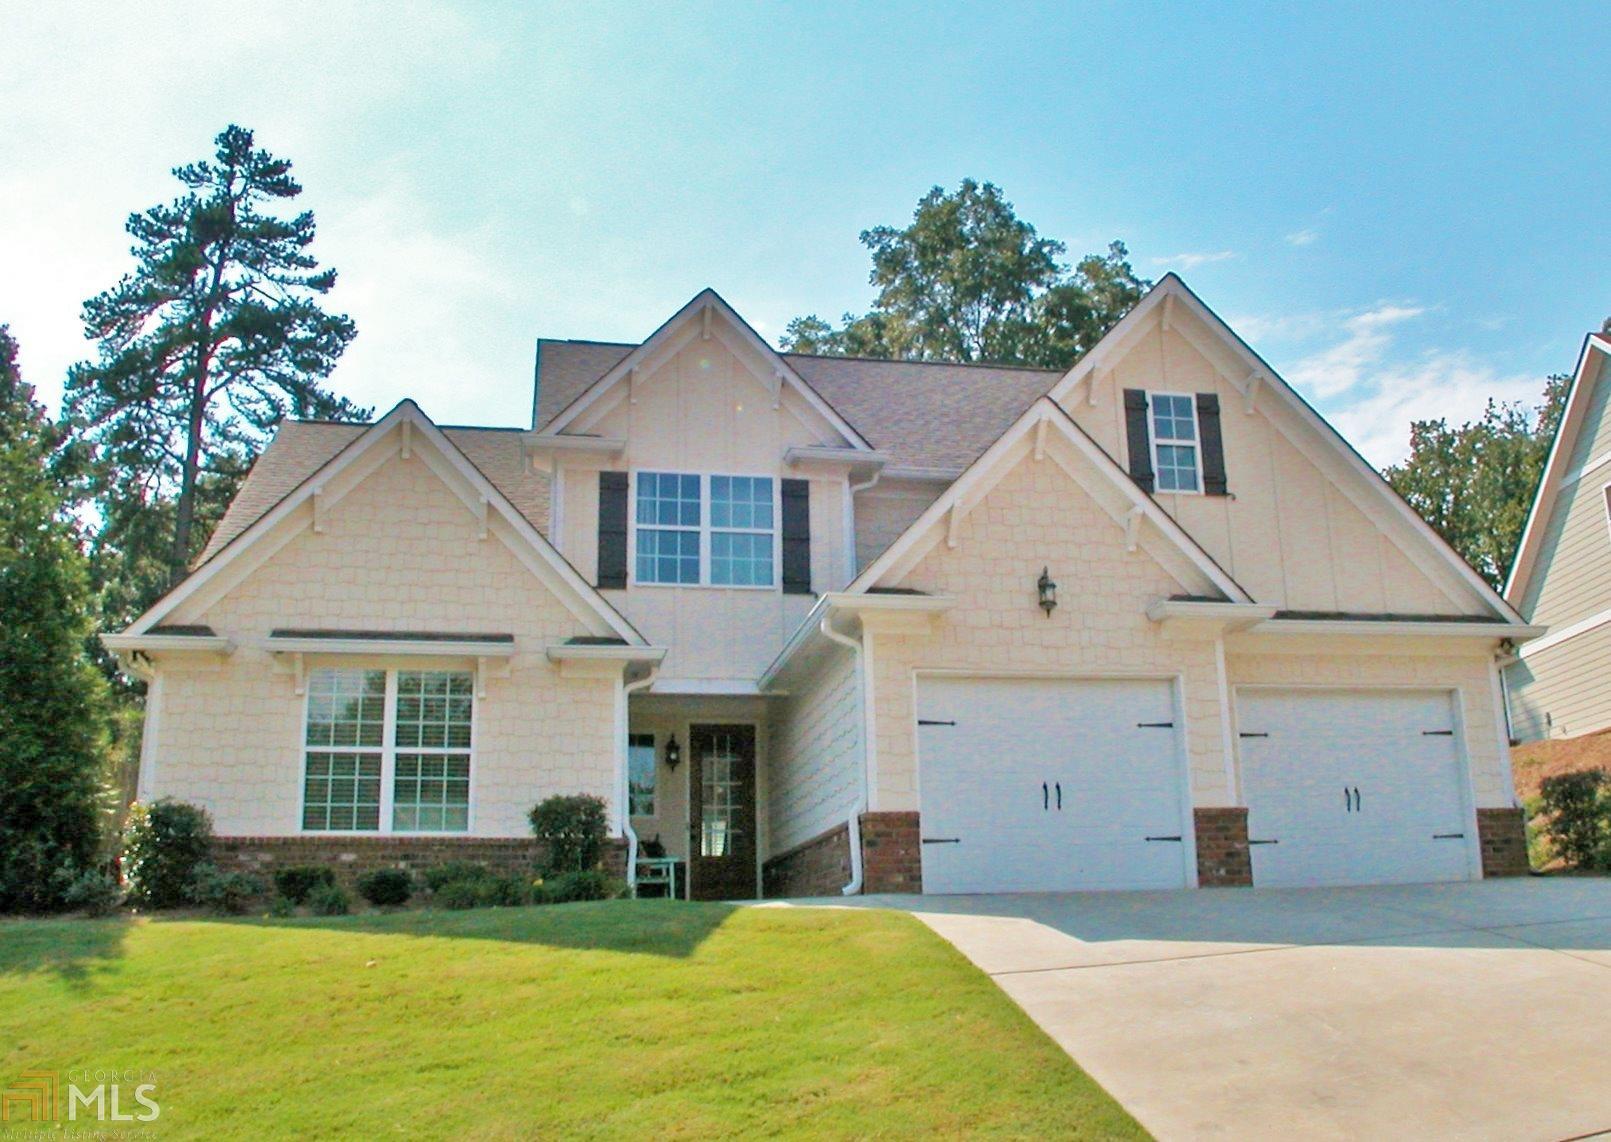 1215 Repton Place, Gainesville, GA 30501